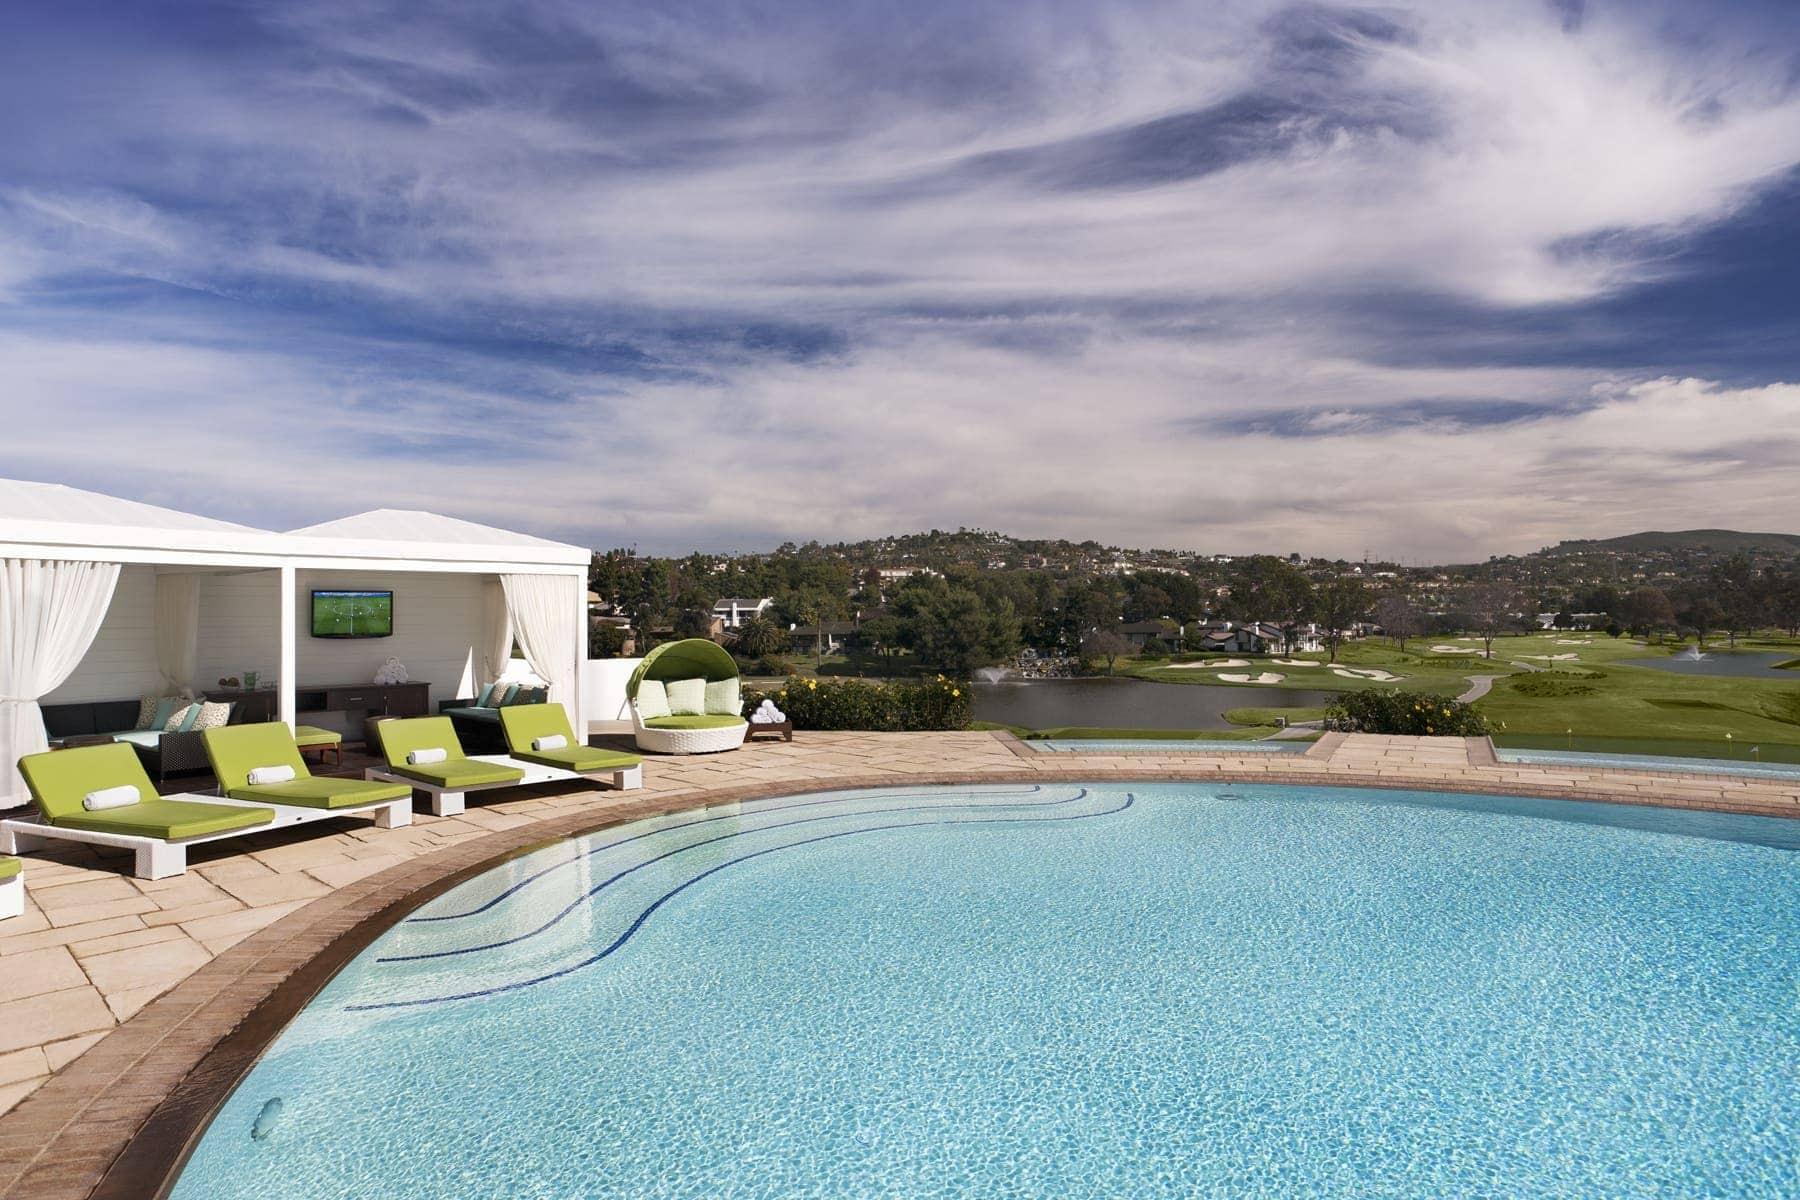 edge-pool-cabana-6x4-300dpi